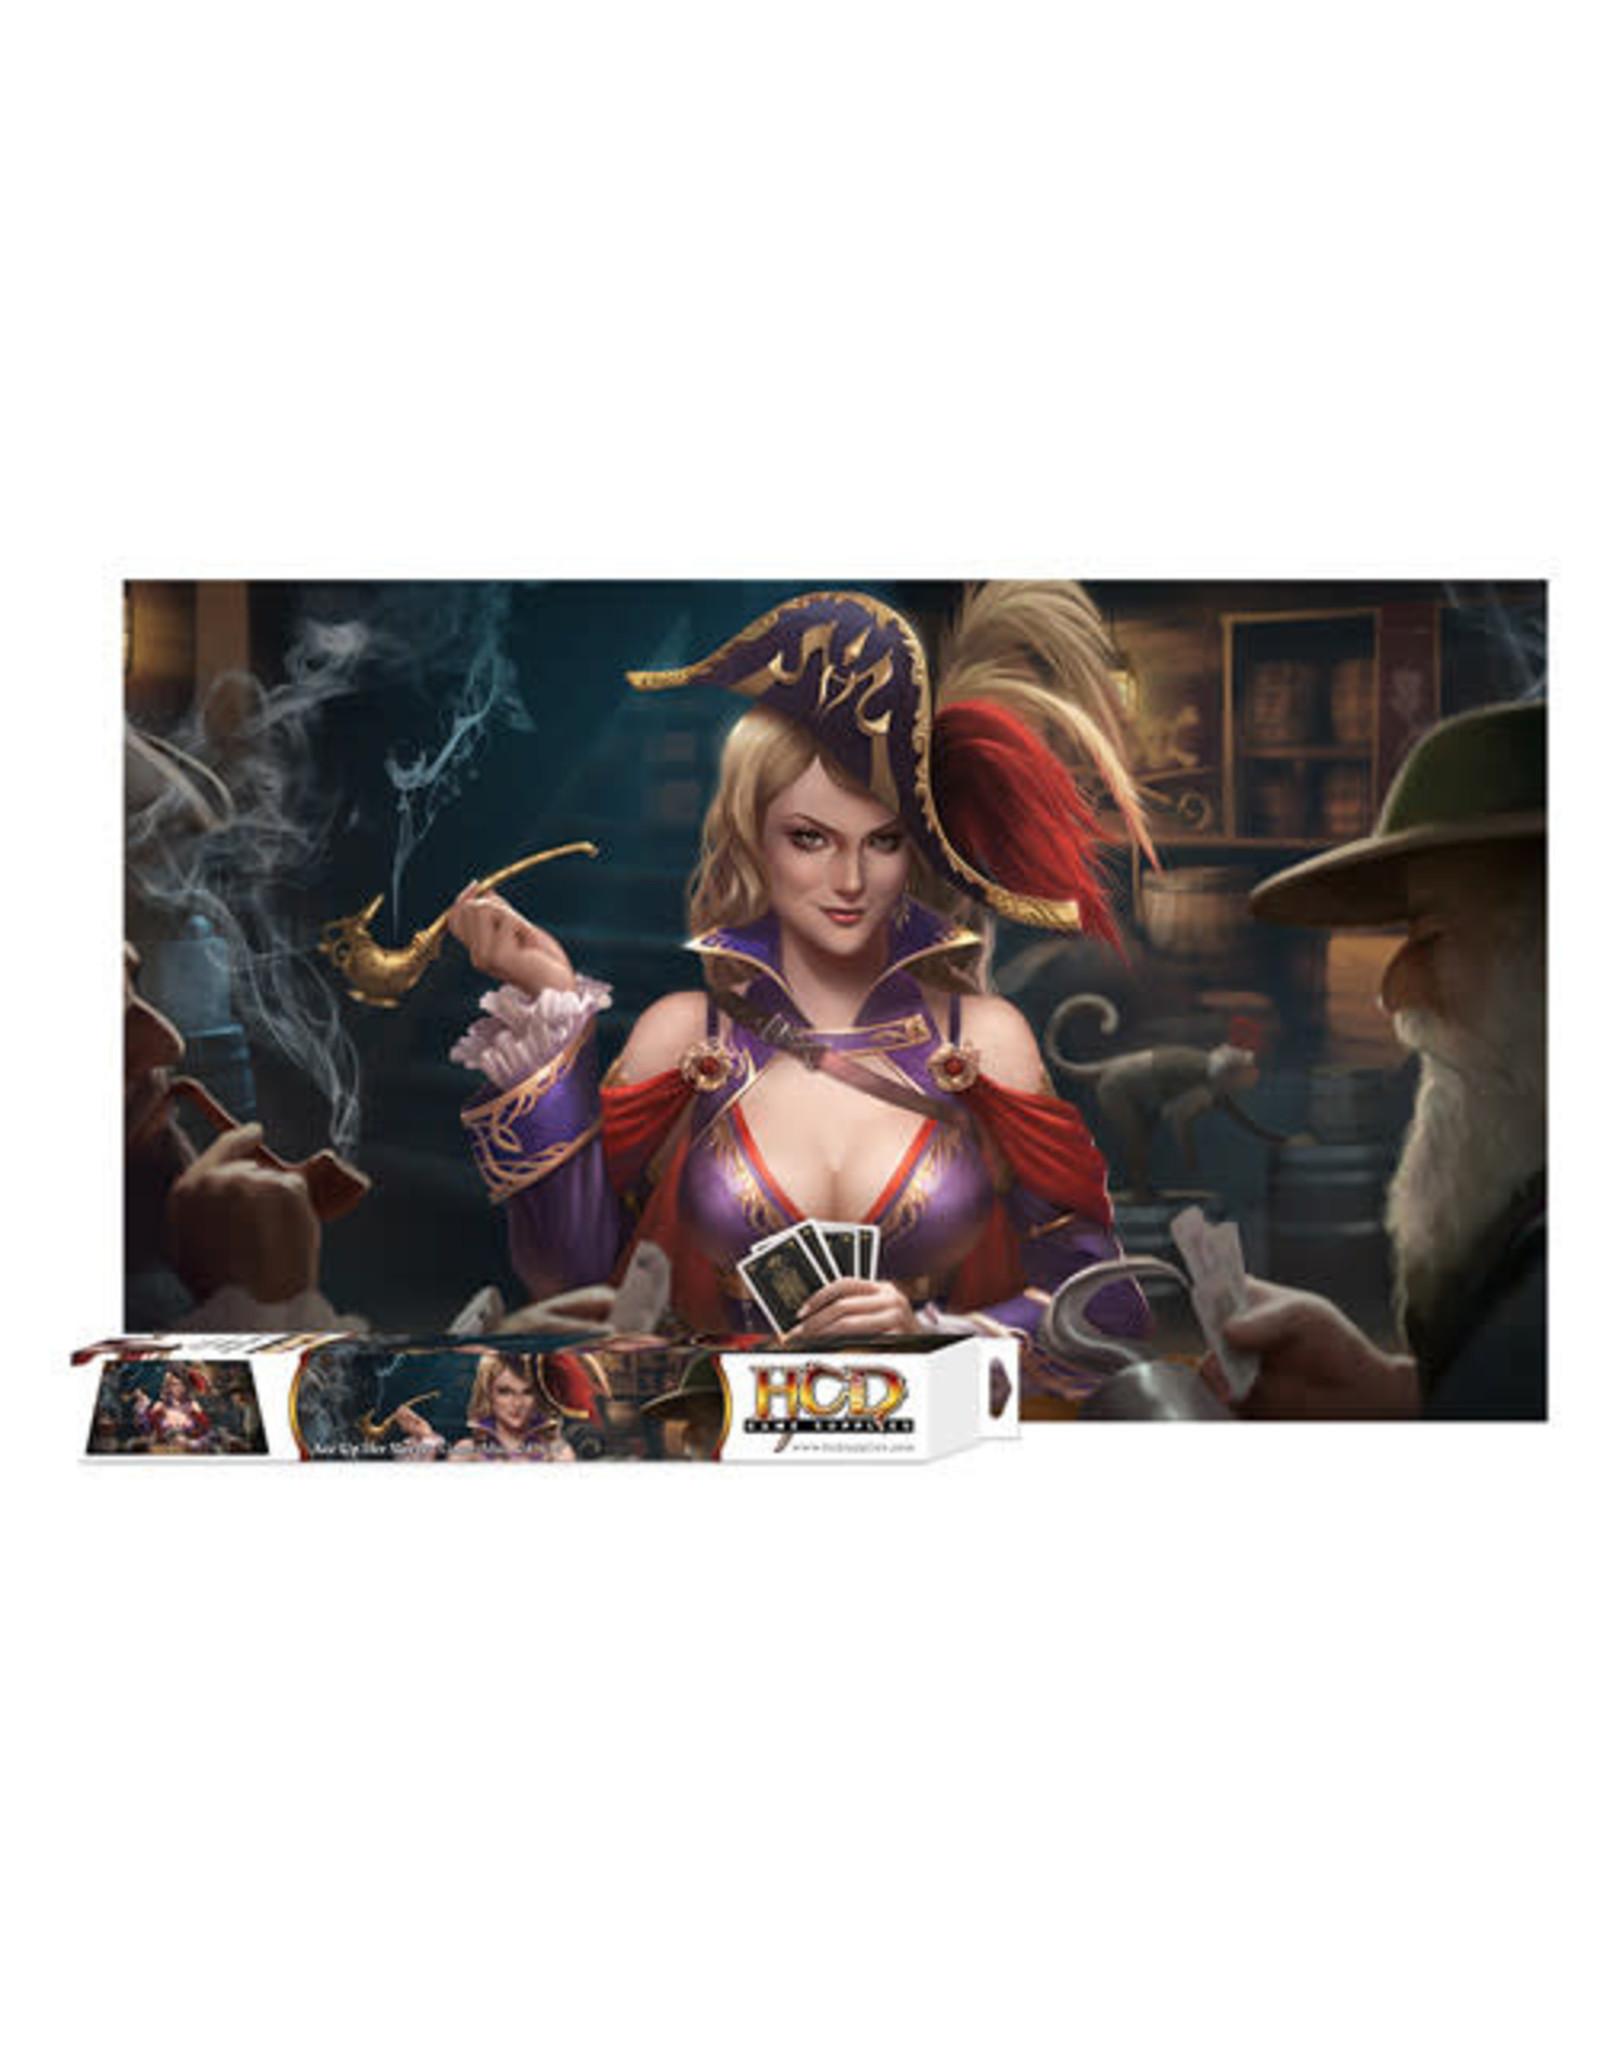 HCD: Playmat: Ace Up Her Sleeve